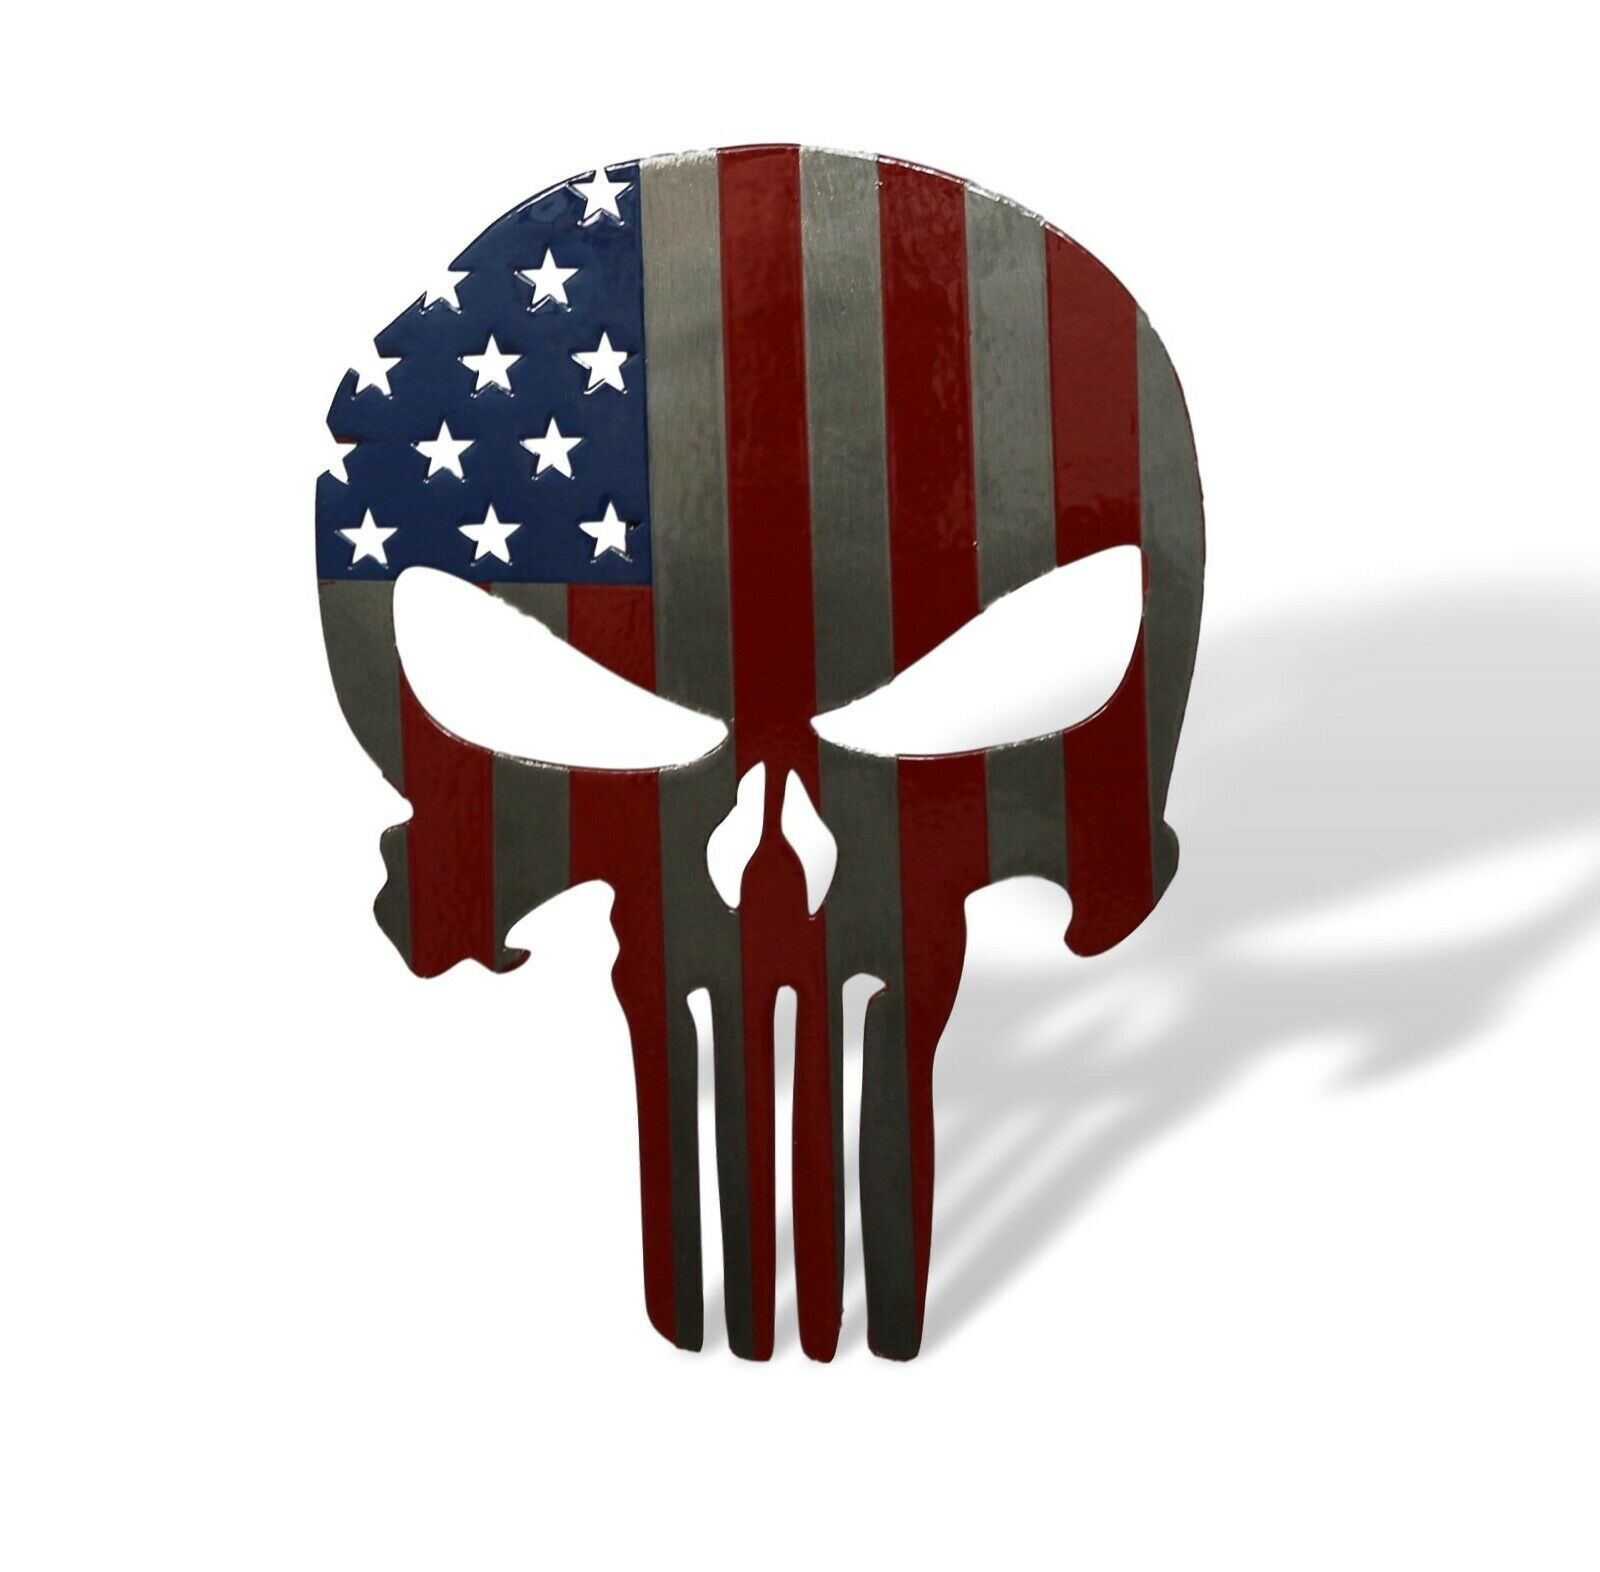 Fox MetalFab Powder Coated Steel Spartan Trailer Hitch Cover//Insert American Flag